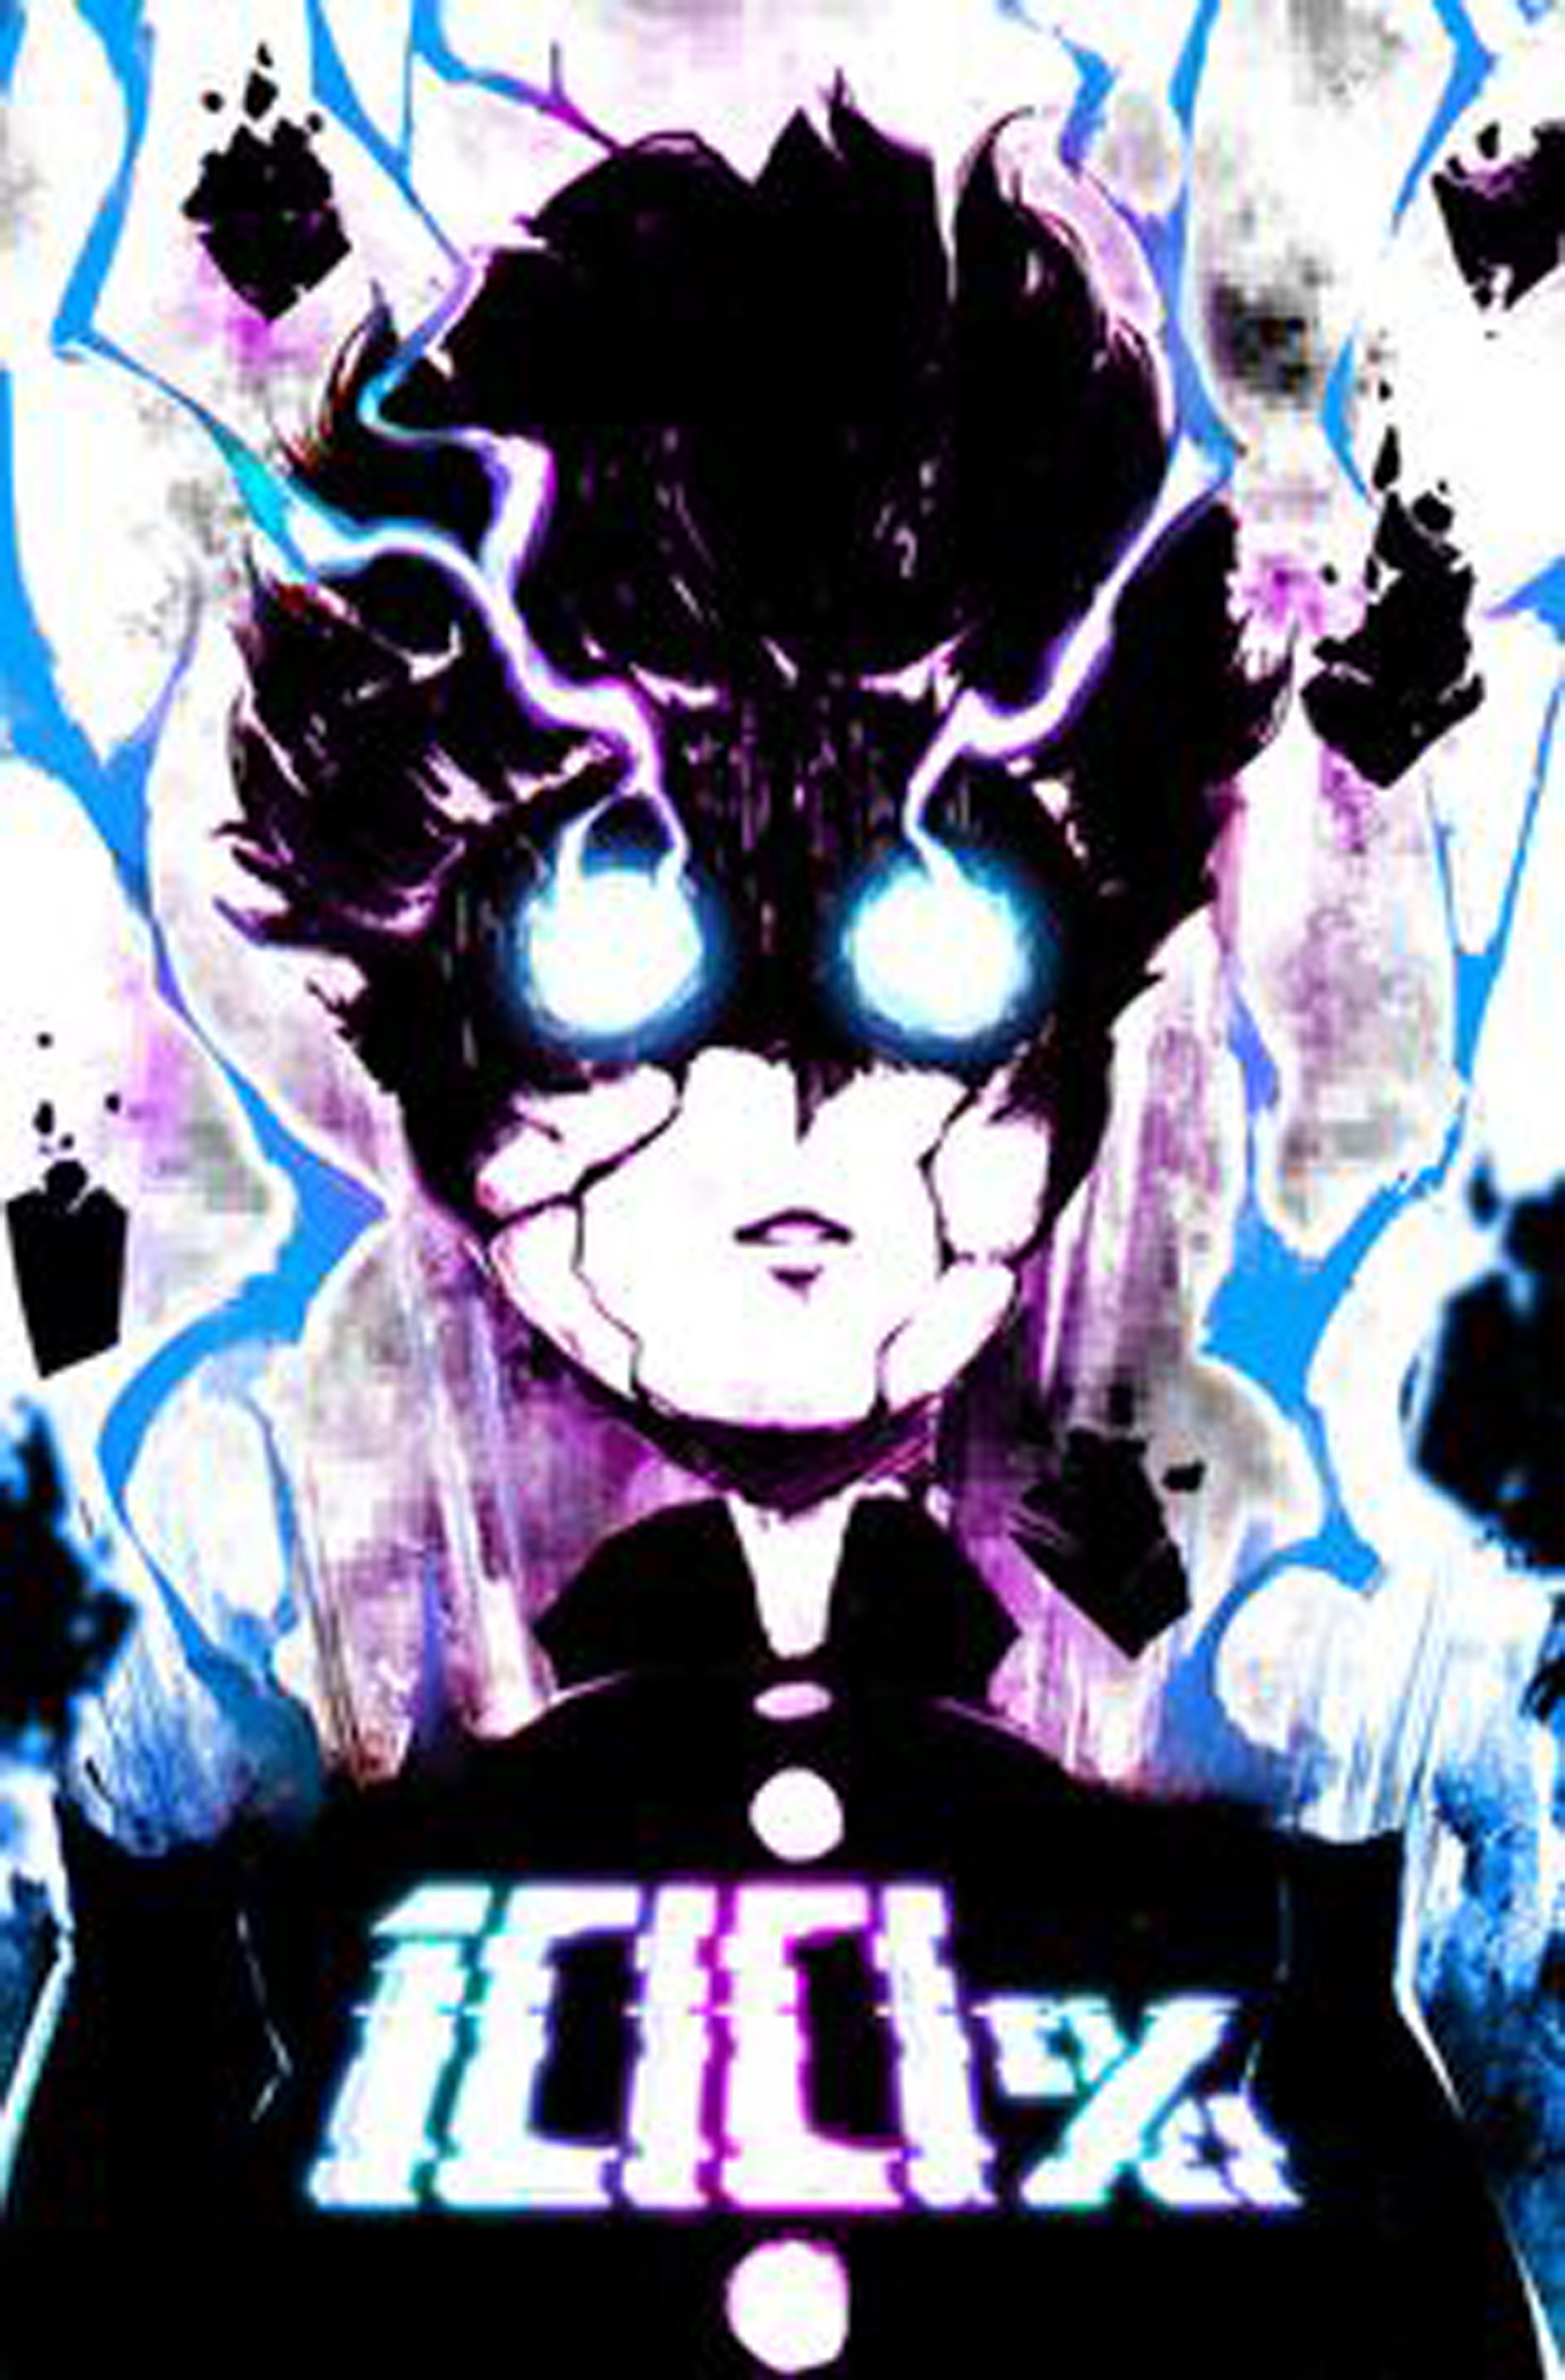 Live Art Shop Redbubble Mob Psycho 100 Anime Mob Psycho 100 Wallpaper Psycho Wallpaper